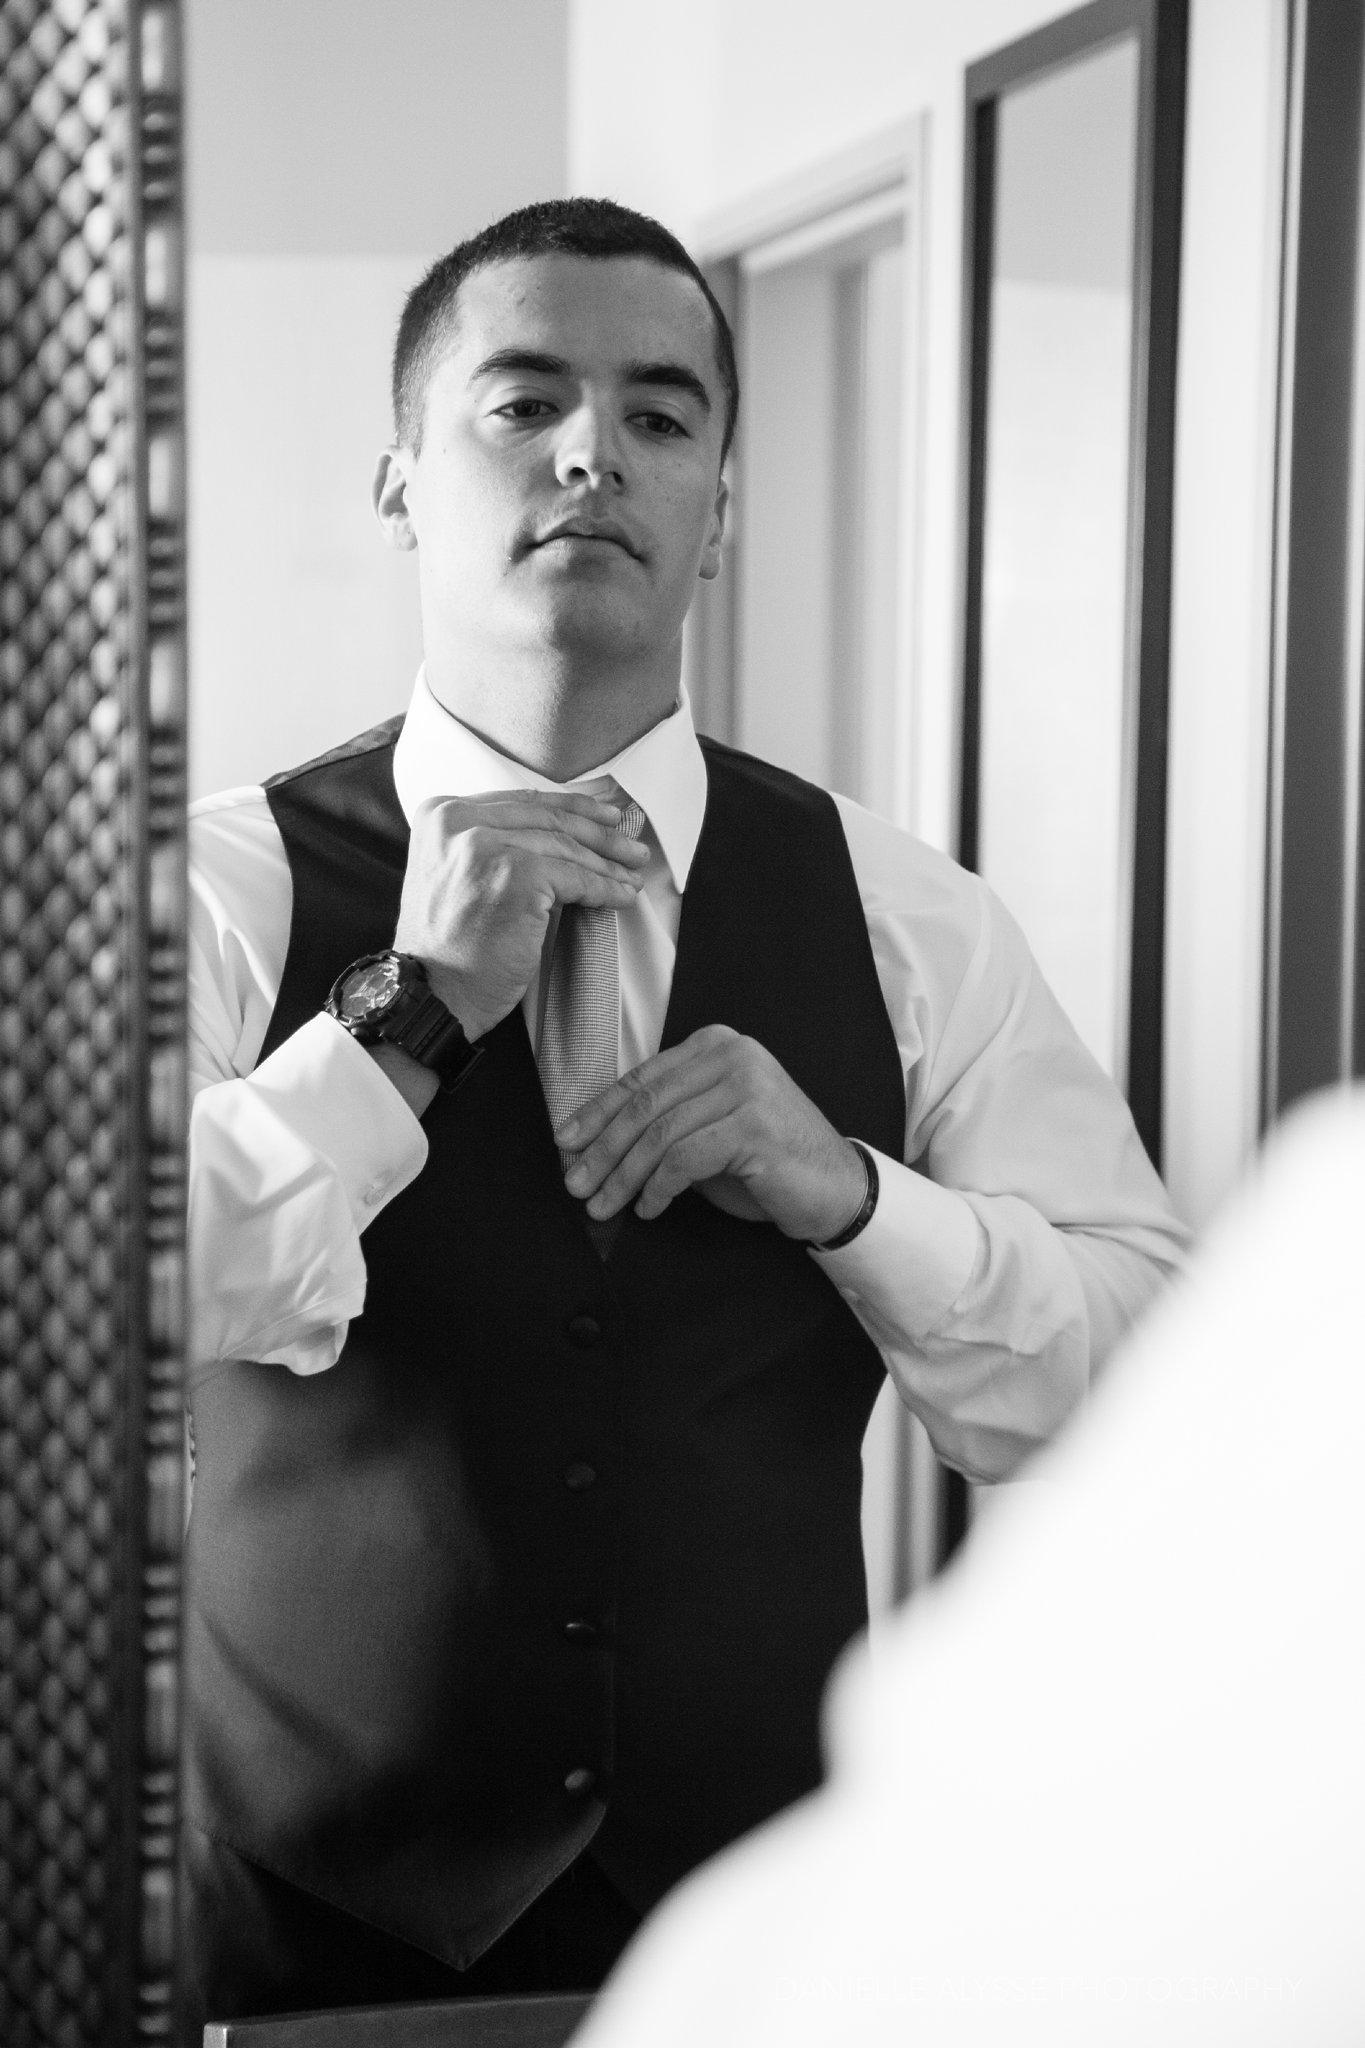 170429_blog_kimberly_ben_wedding_san_mateo_curiodyssey_danielle_alysse_photography_sacramento_photographer0081_WEB.jpg